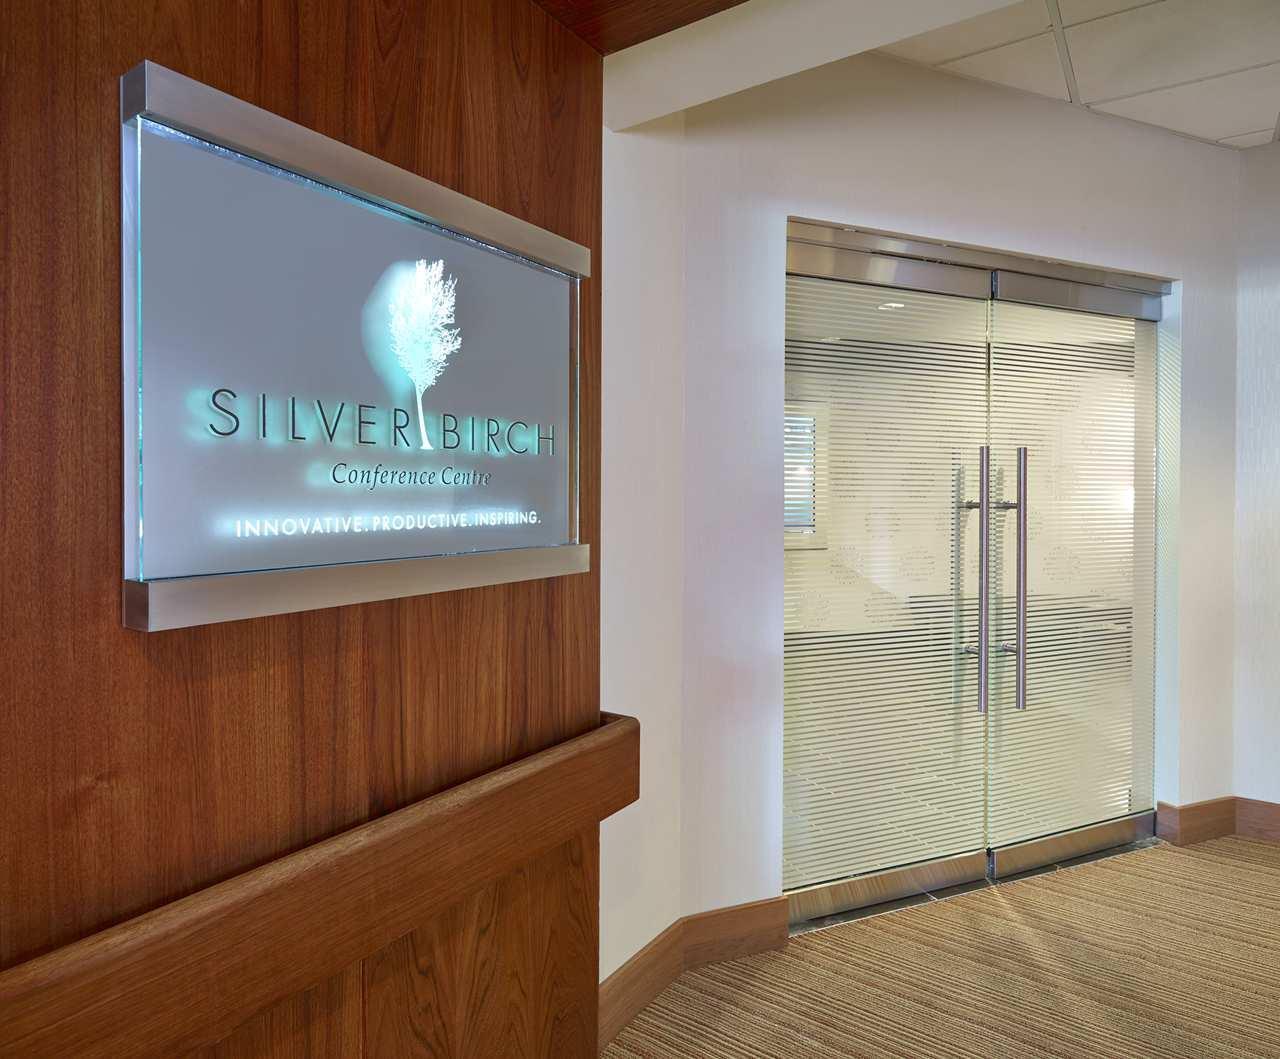 DoubleTree by Hilton Hotel West Edmonton in Edmonton: SilverBirch Conference Center Entrance